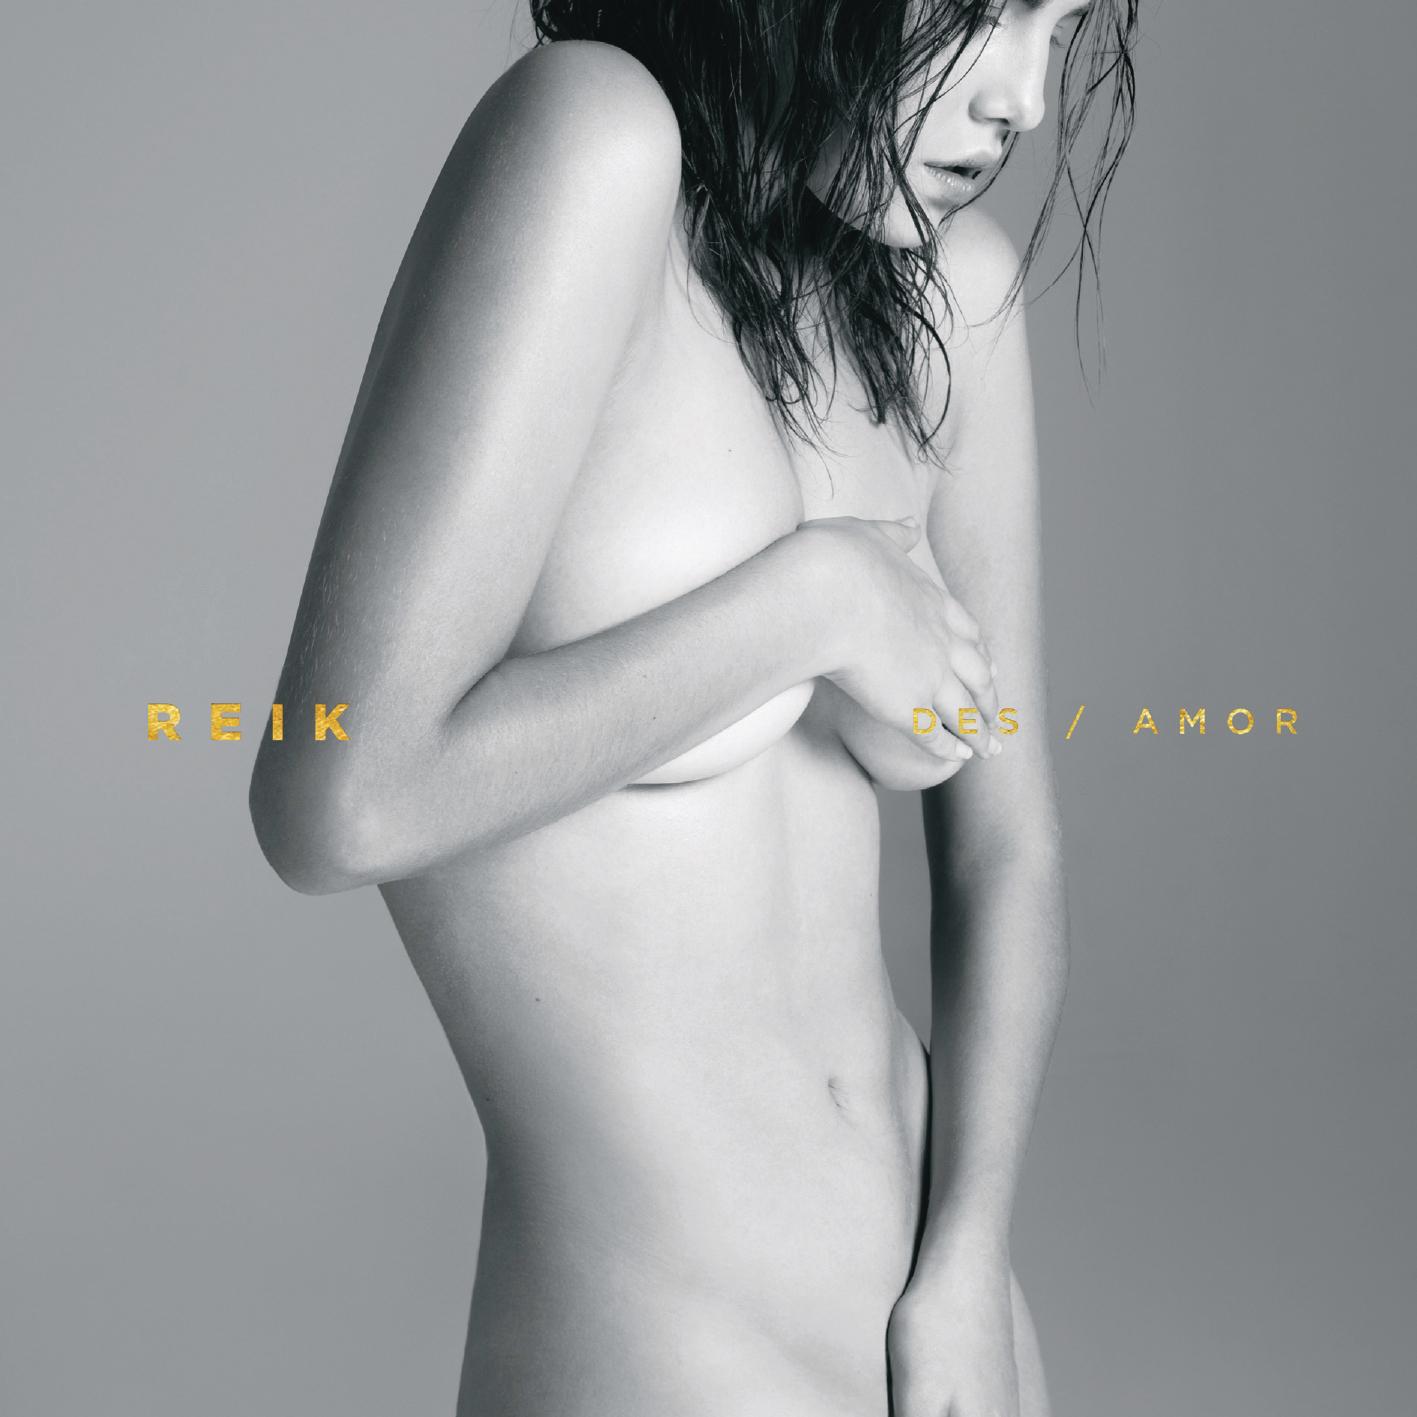 Reik - Des/Amor Cover